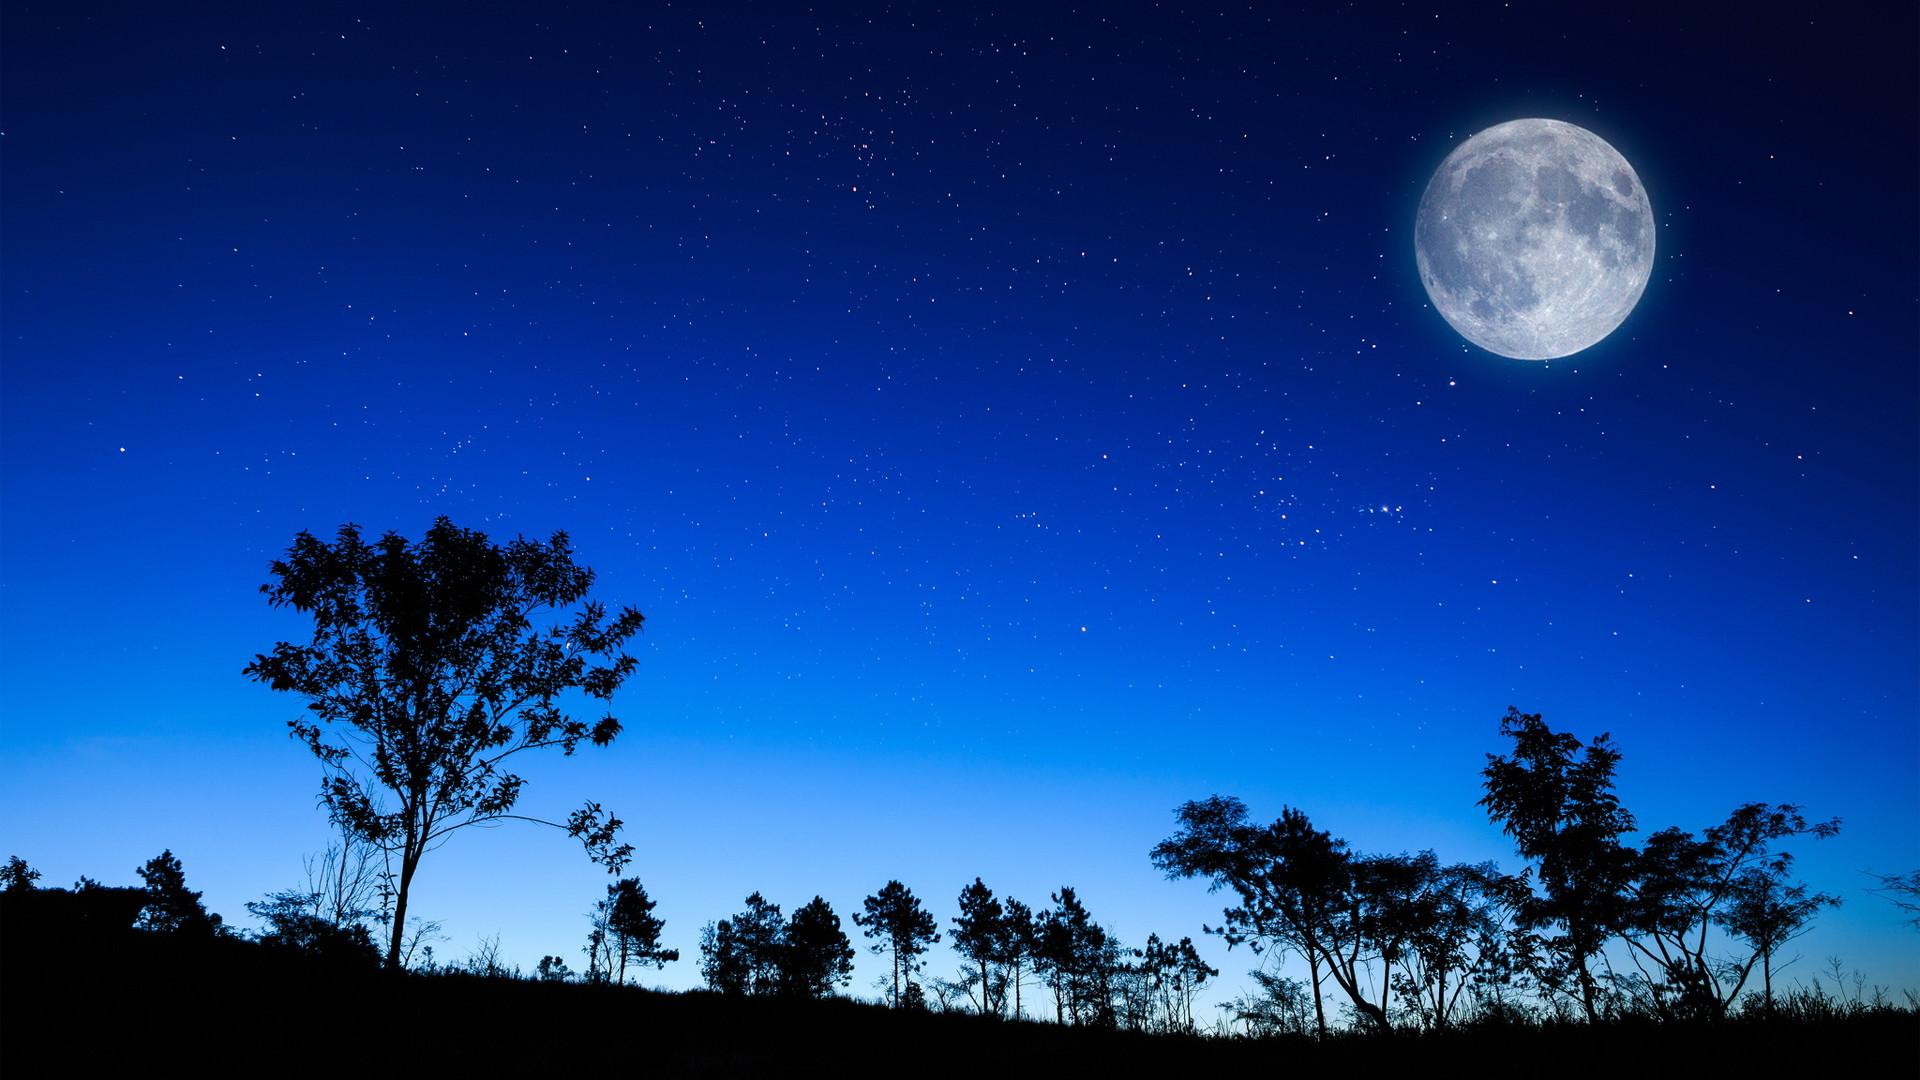 fire, full moon, night, river, wood, island, art, painting   HD wallpapers    Pinterest   Full moon night